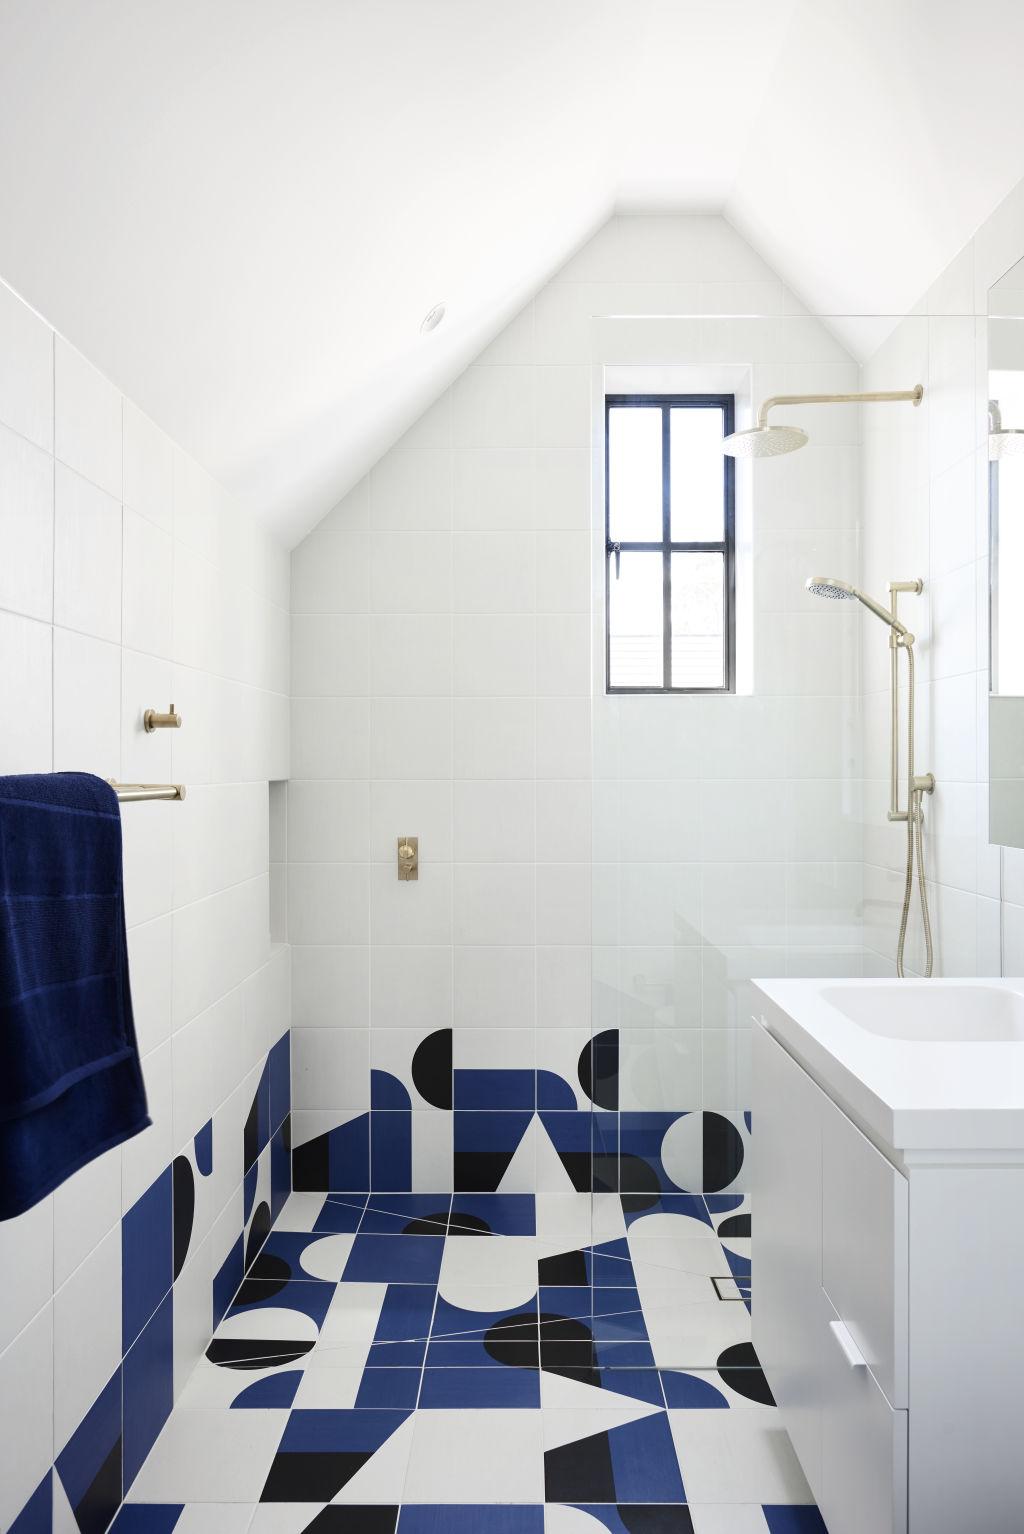 Attic Magic by Windust Architecture x Interiors  Photographer: Eve Wilson  Builder: APC Build  Stylist: Origami Solutions